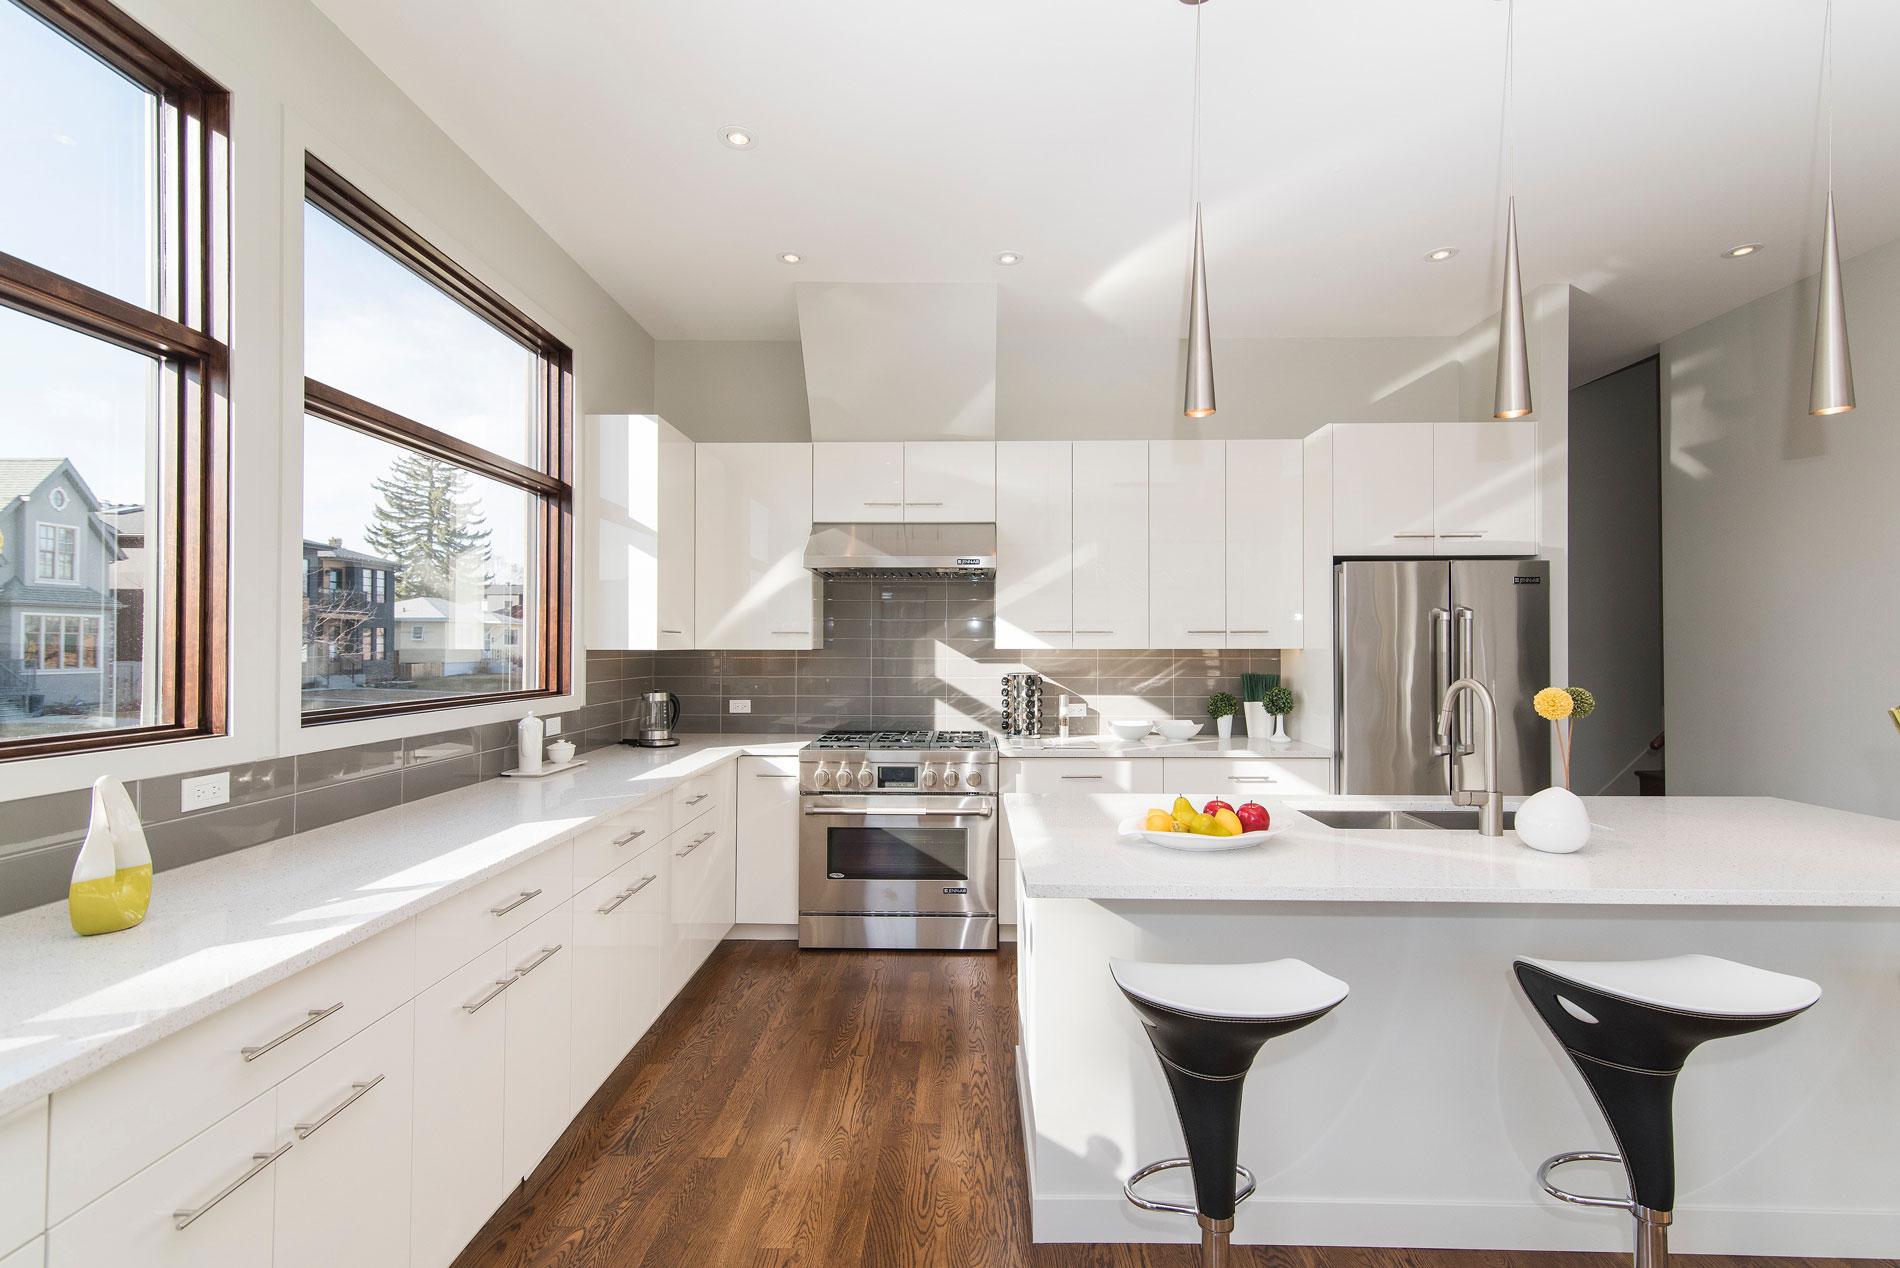 Kawana Cabinets Pty Ltd - Kitchen Renovations & Designs ...